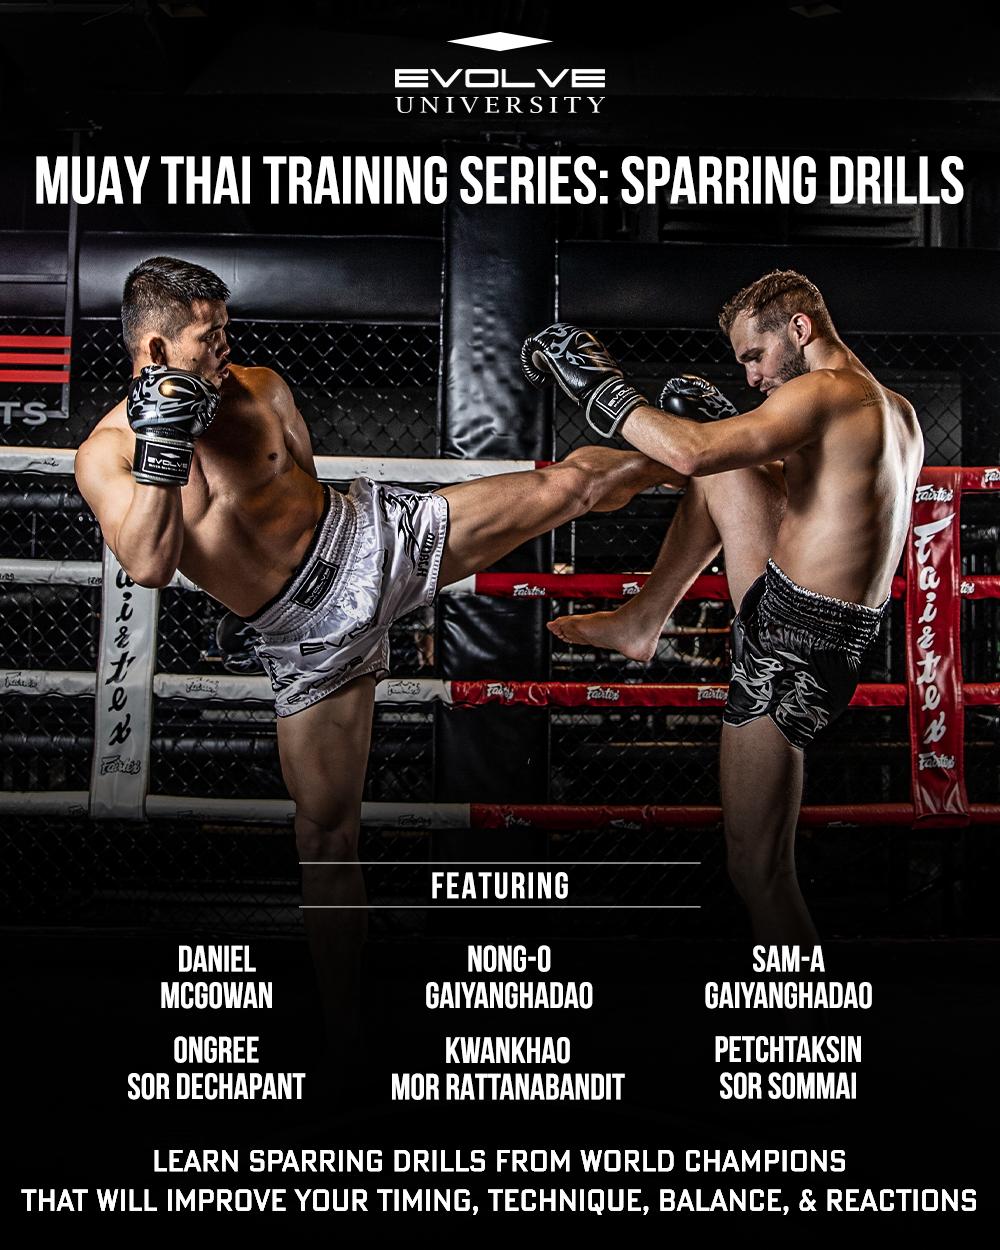 Muay Thai Training Series: Sparring Drills